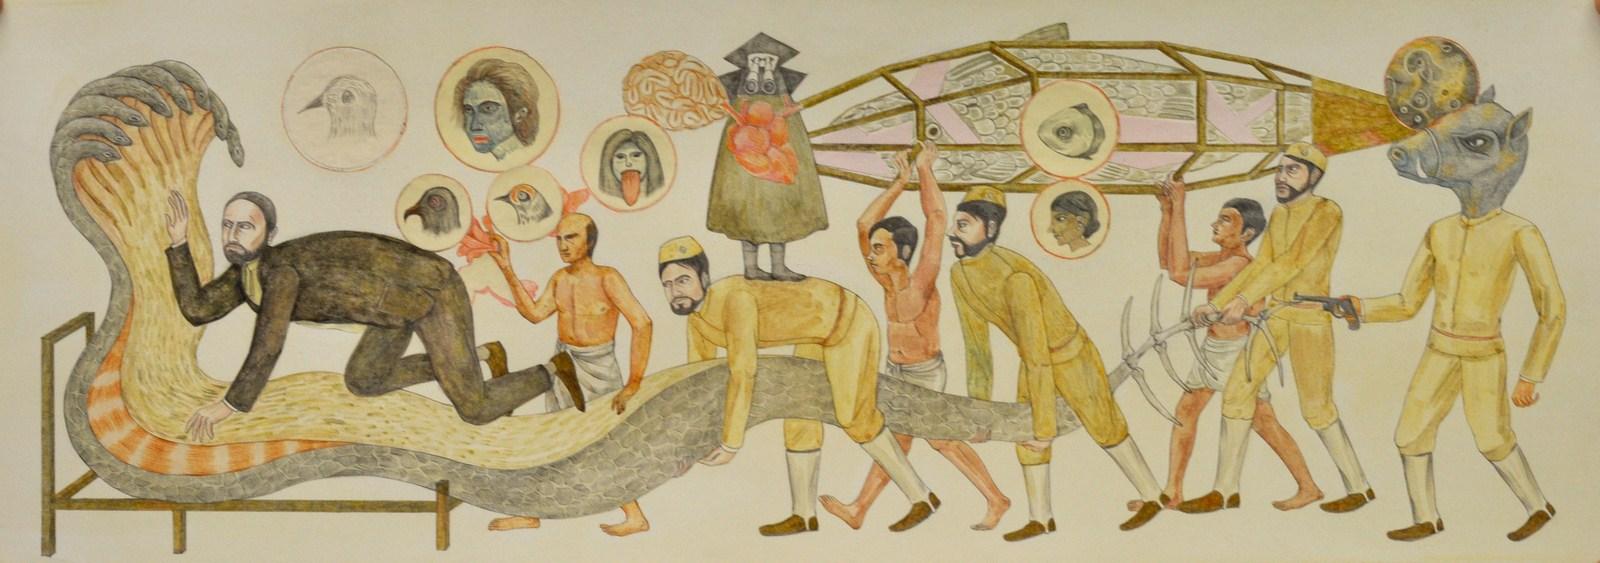 "Shrimanti Saha | The Bed | Graphite,pencil colours, water colour, casein, collage on paper | 8"" x 22"" | 2017"